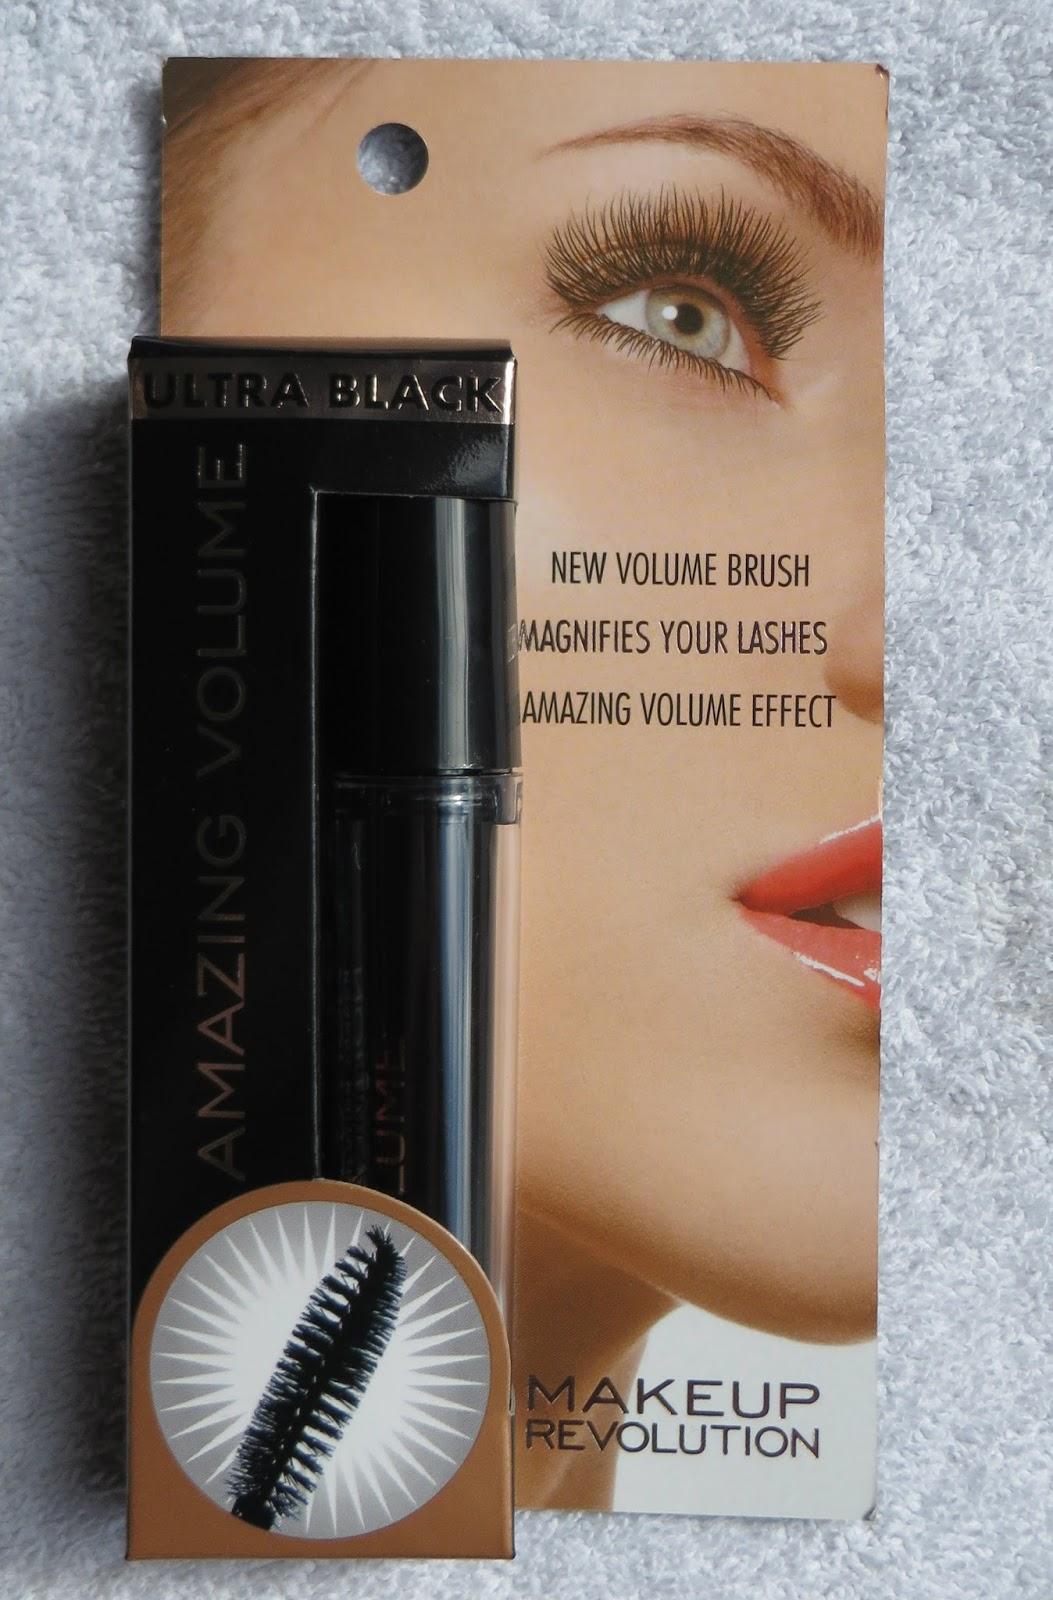 ca52b5f95b3 Nina's Bargain Beauty*: Makeup Revolution Amazing Volume Mascara Review